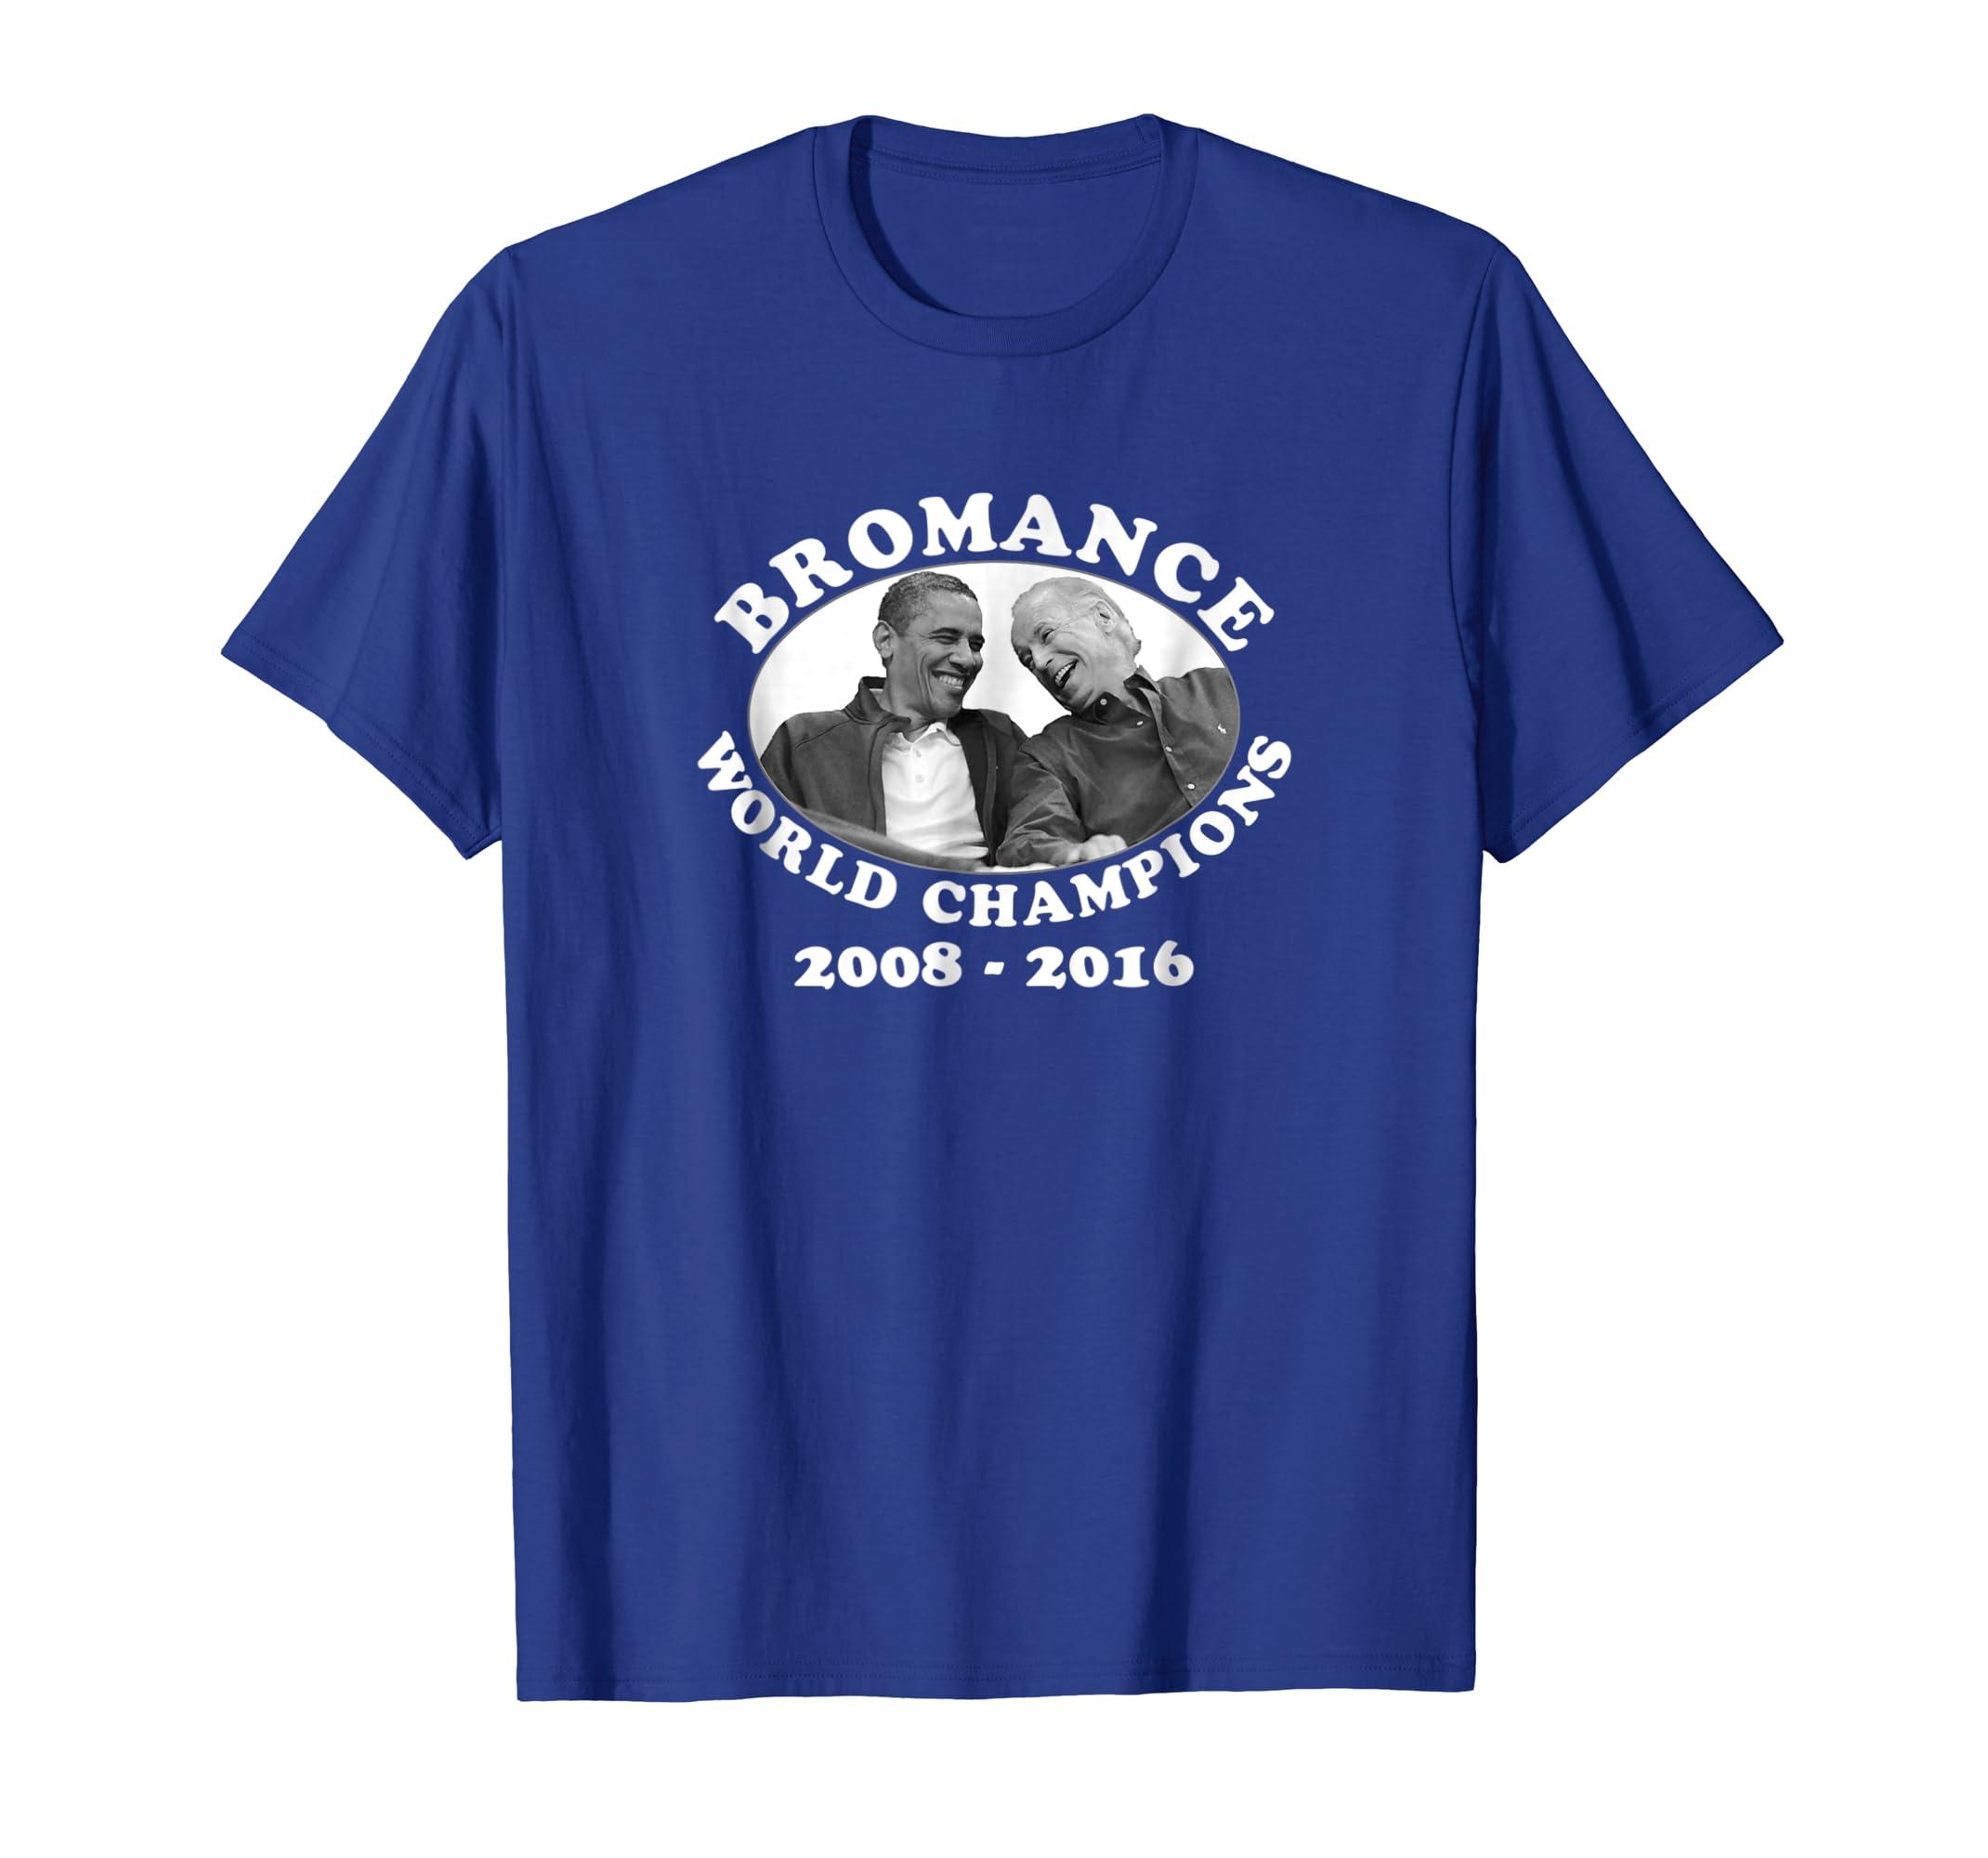 Bromance World Champions Tee   Obama and Biden-Awarplus